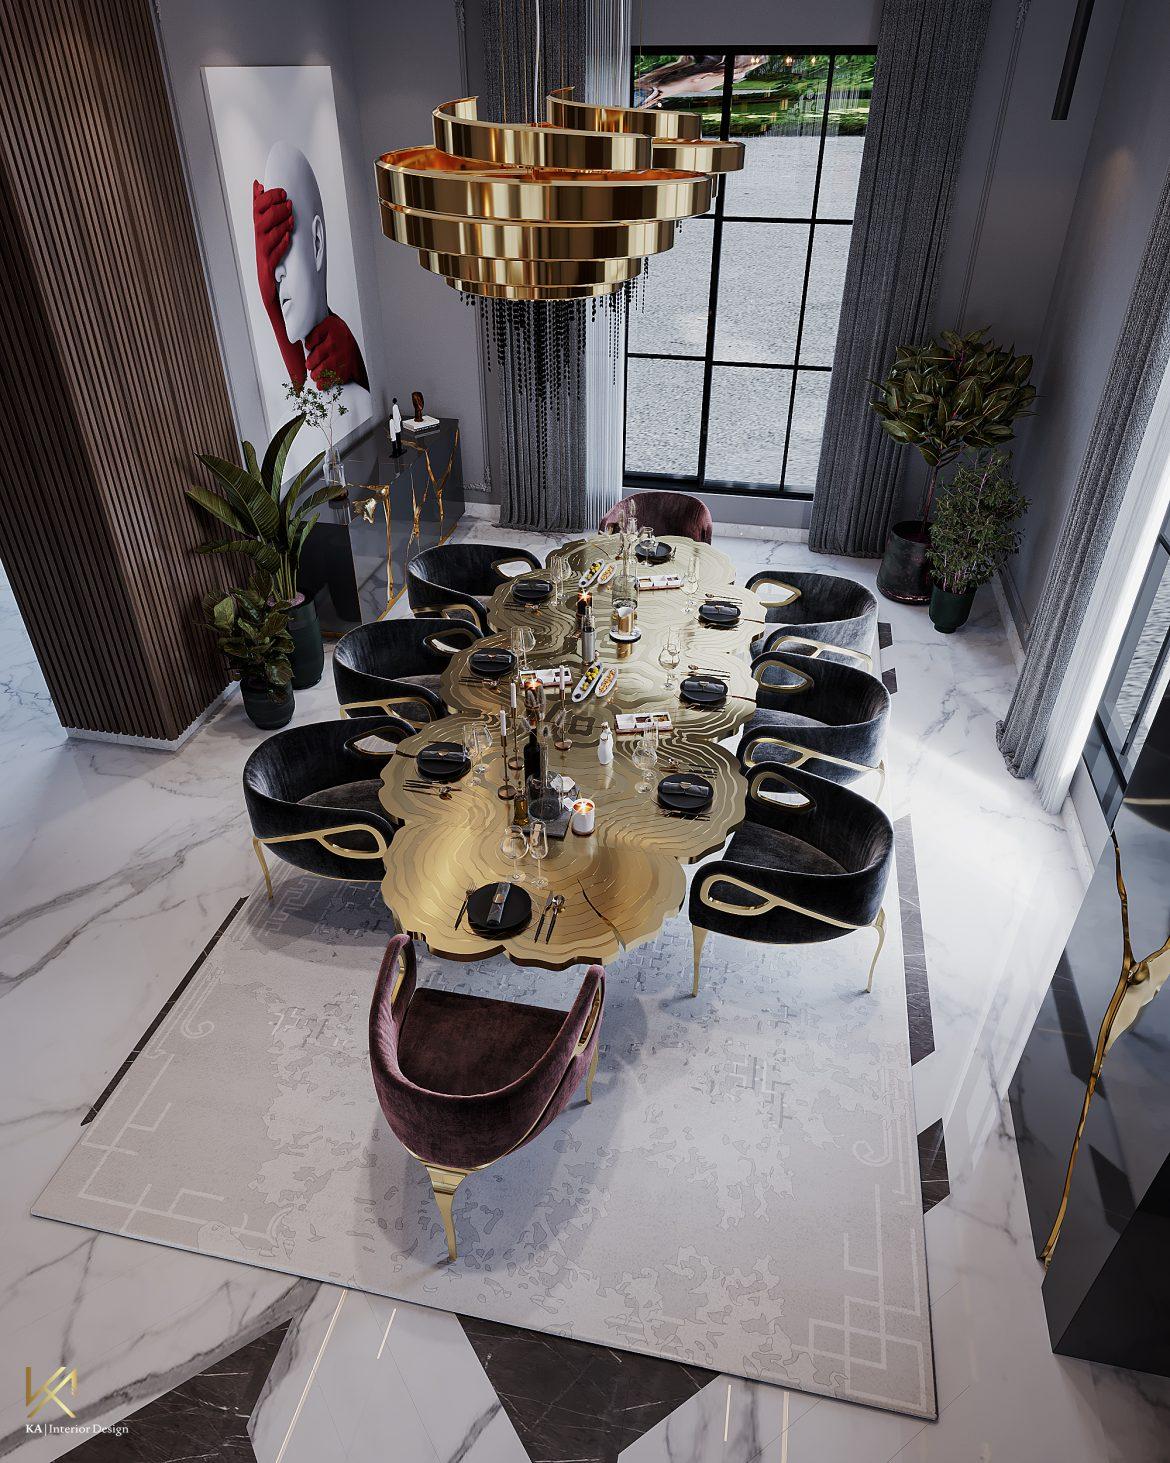 Covet House x K.A Interior Design: A Opulent Modern Classic Villa in Riyadh  Covet House x K.A Interior Design:  A Opulent Modern Classic Villa In Riyadh covet house k a interior design lavish modern classic villa riyadh 5